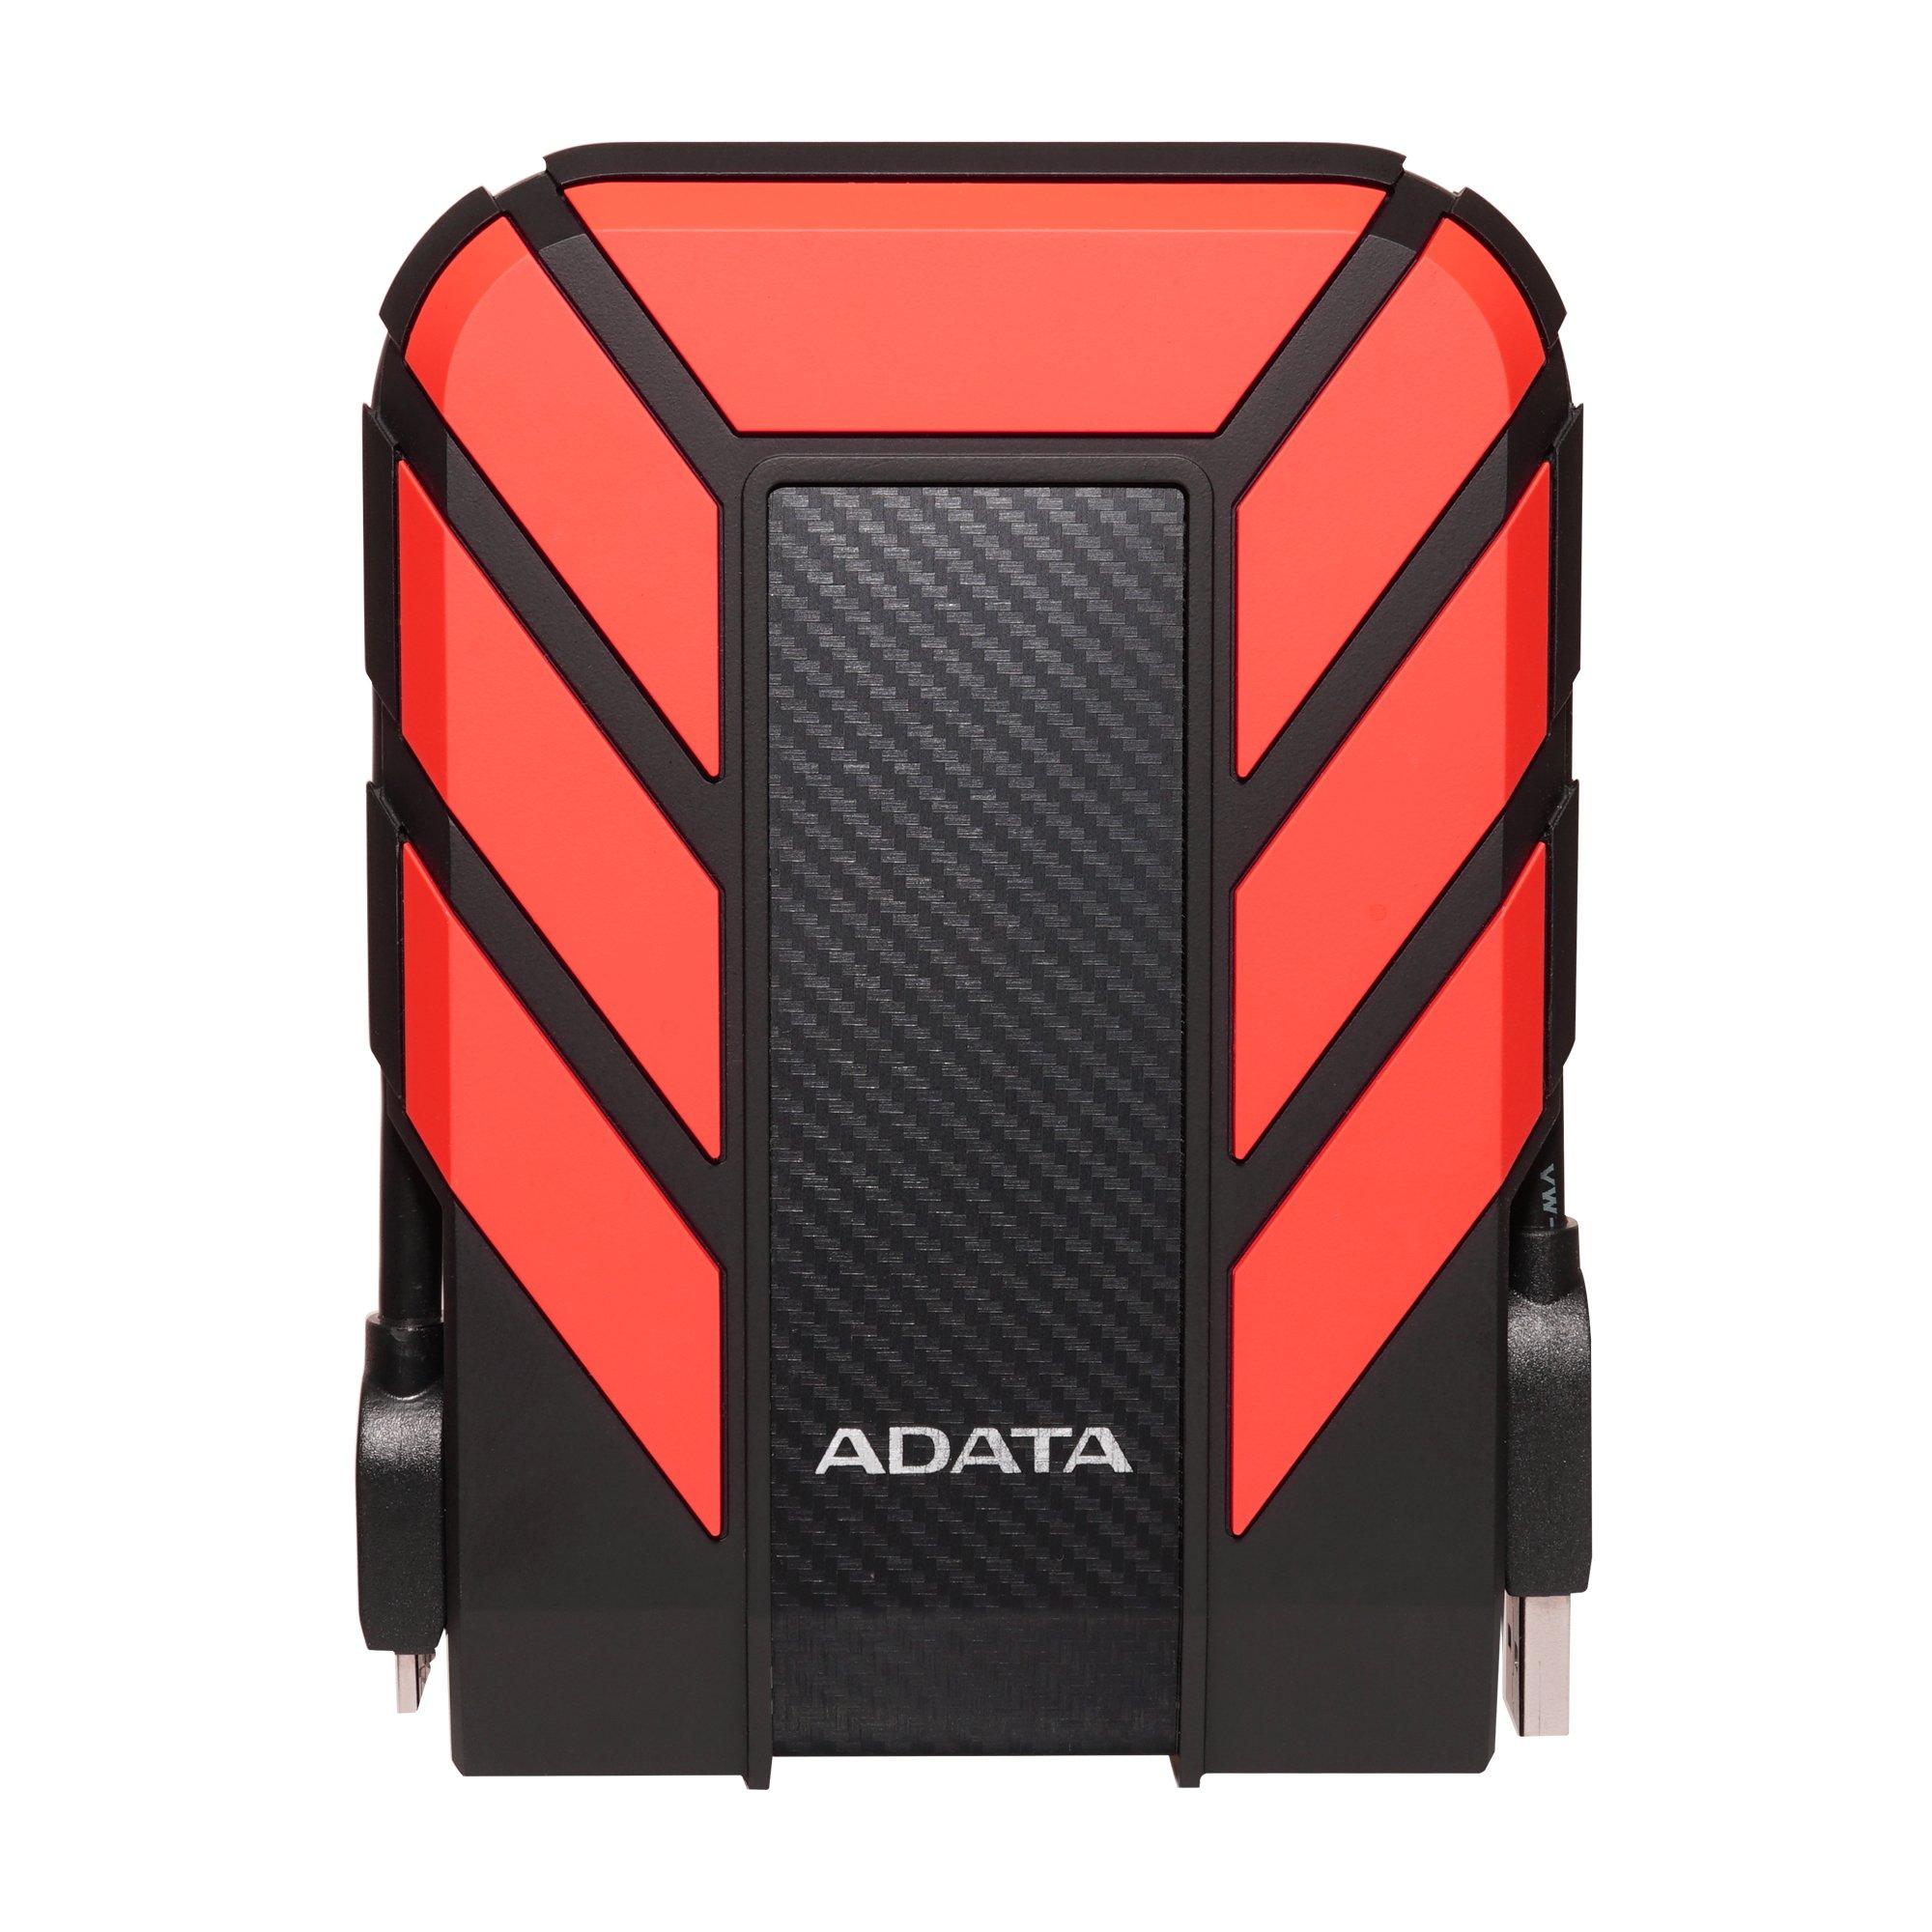 ADATA AHD710P-1TU31-CRD Pro 1TB USB 3.1 IP68 Waterproof/Shockproof/Dustproof Ruggedized External Hard Drive, Red